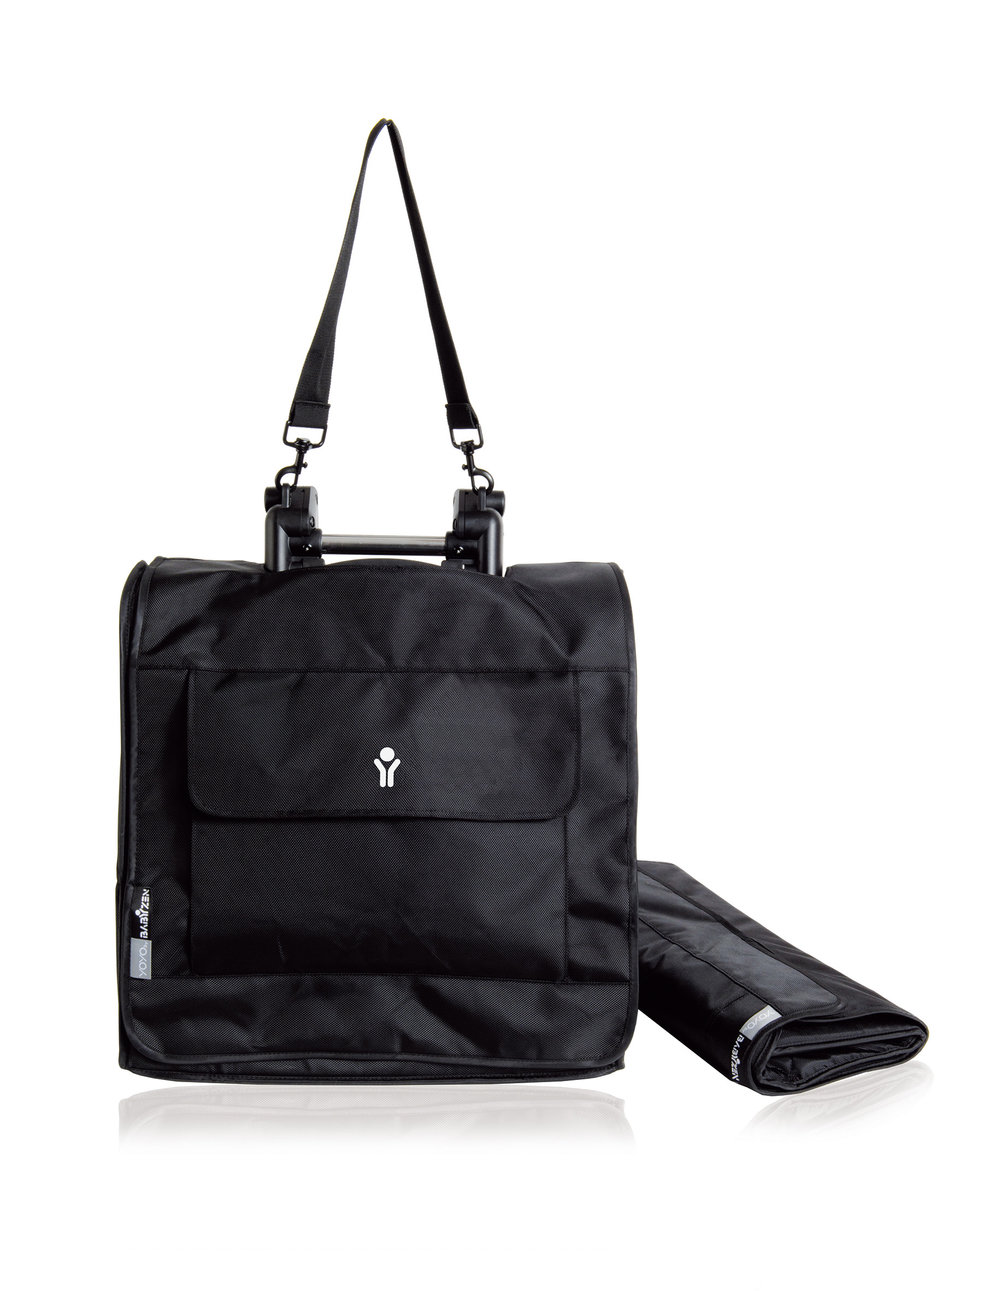 Babyzen Travel Bag   from £10.00